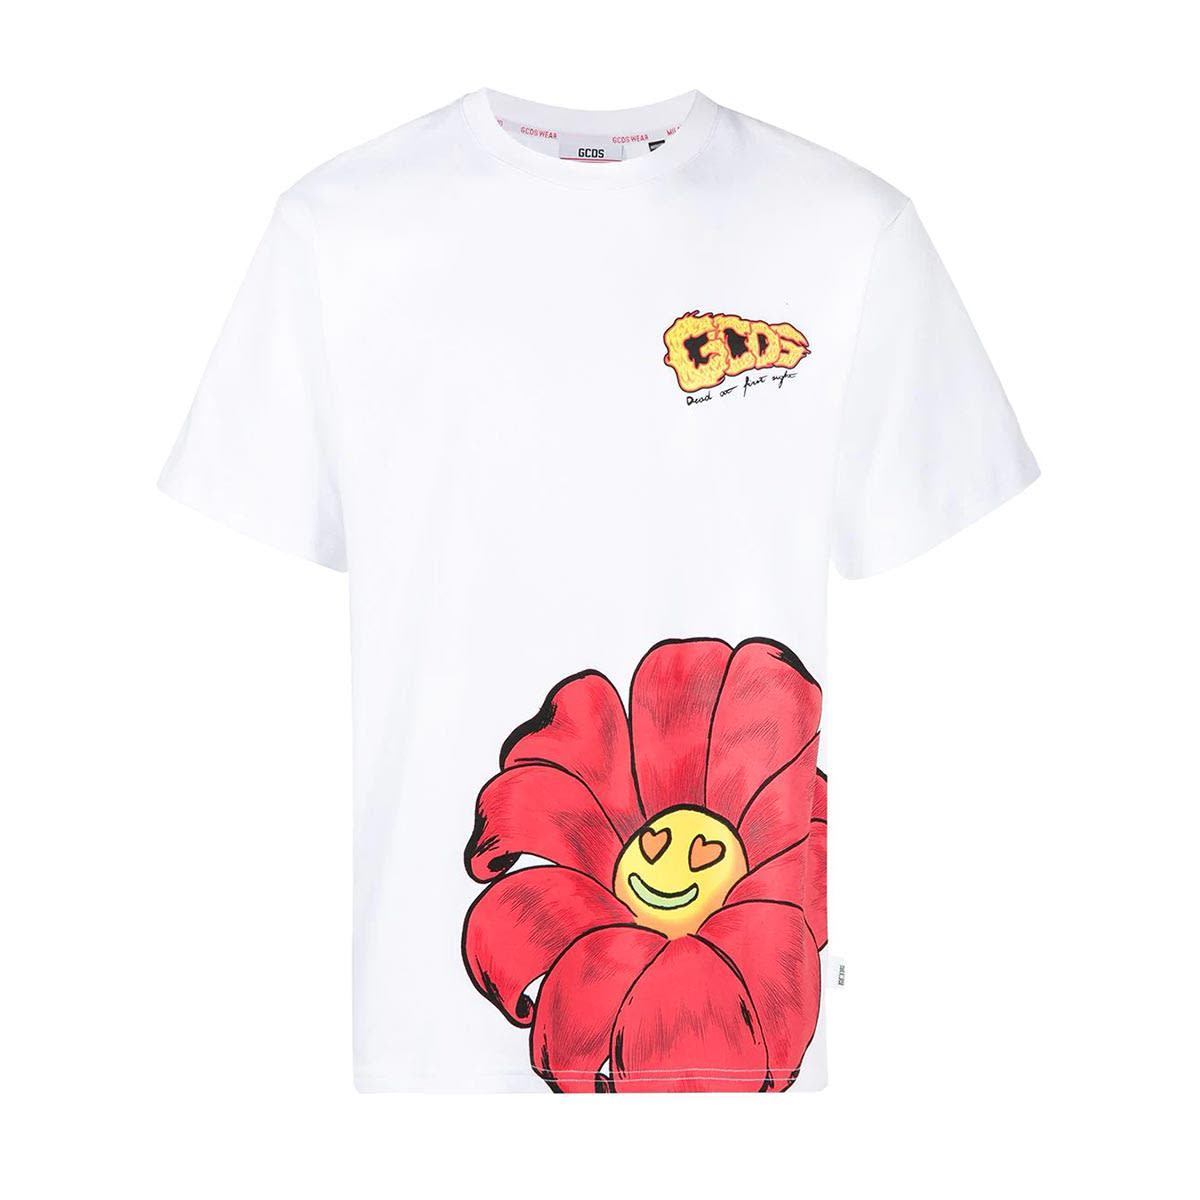 GCDS T-shirt Bianca Con Fiore Uomo